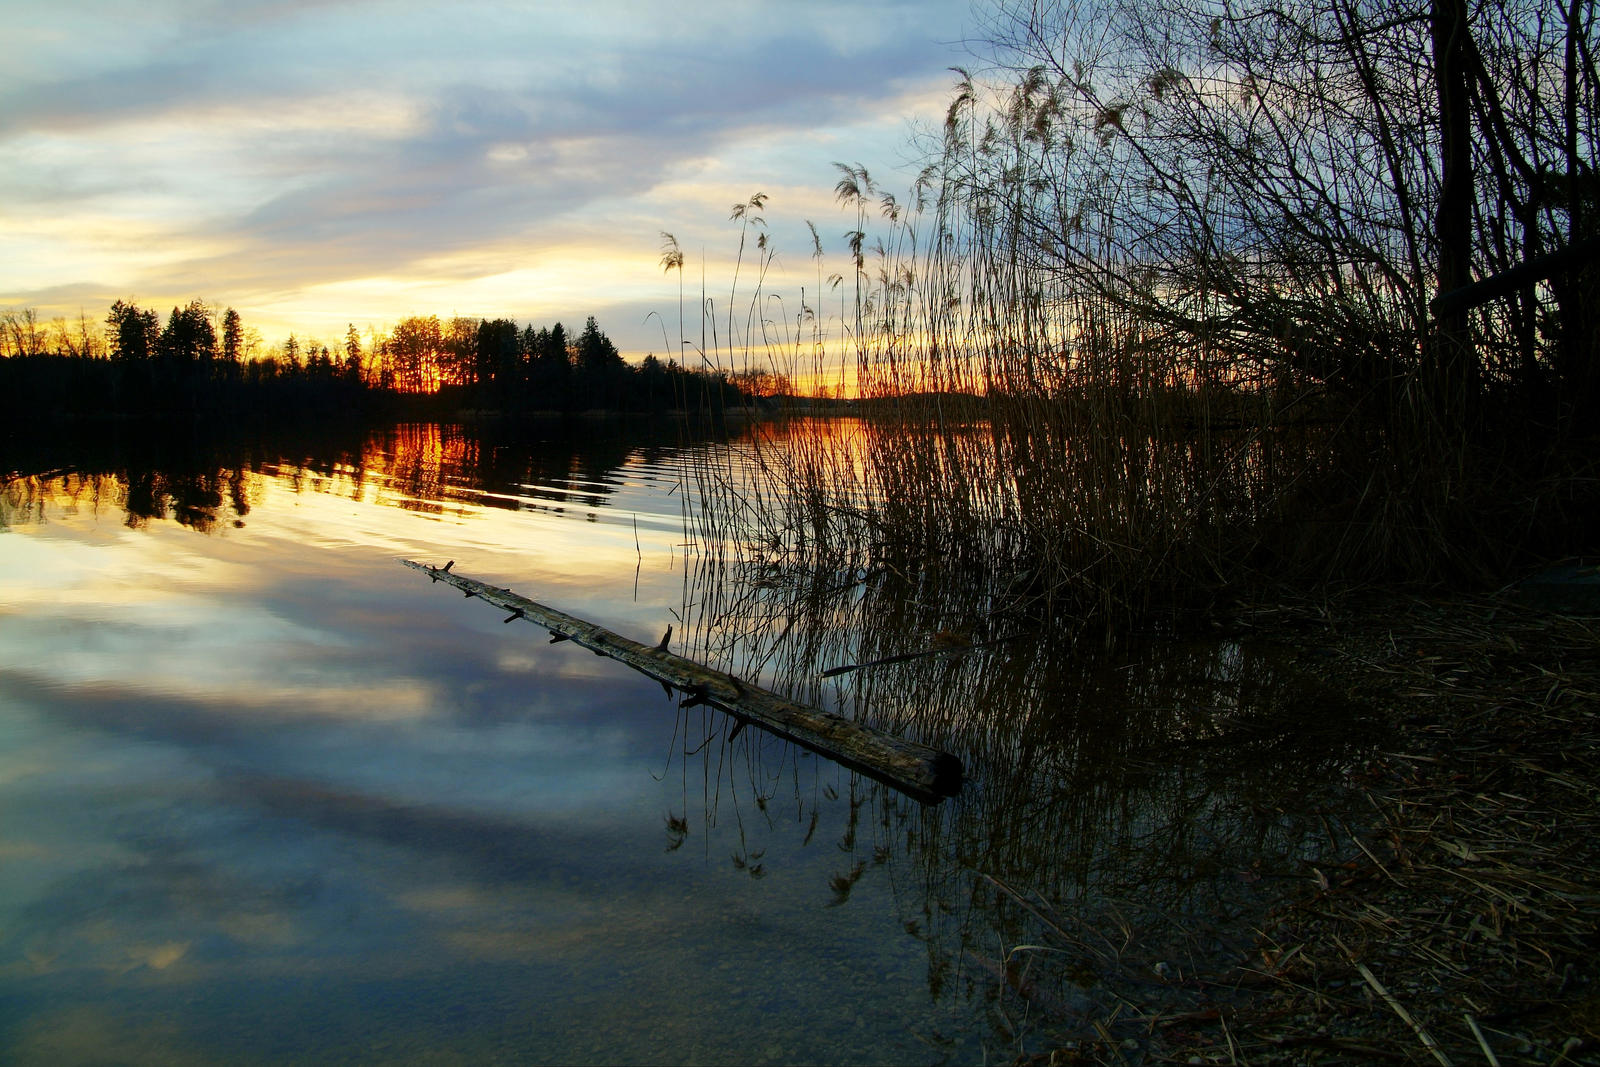 Golden Hour Lakeside by Burtn